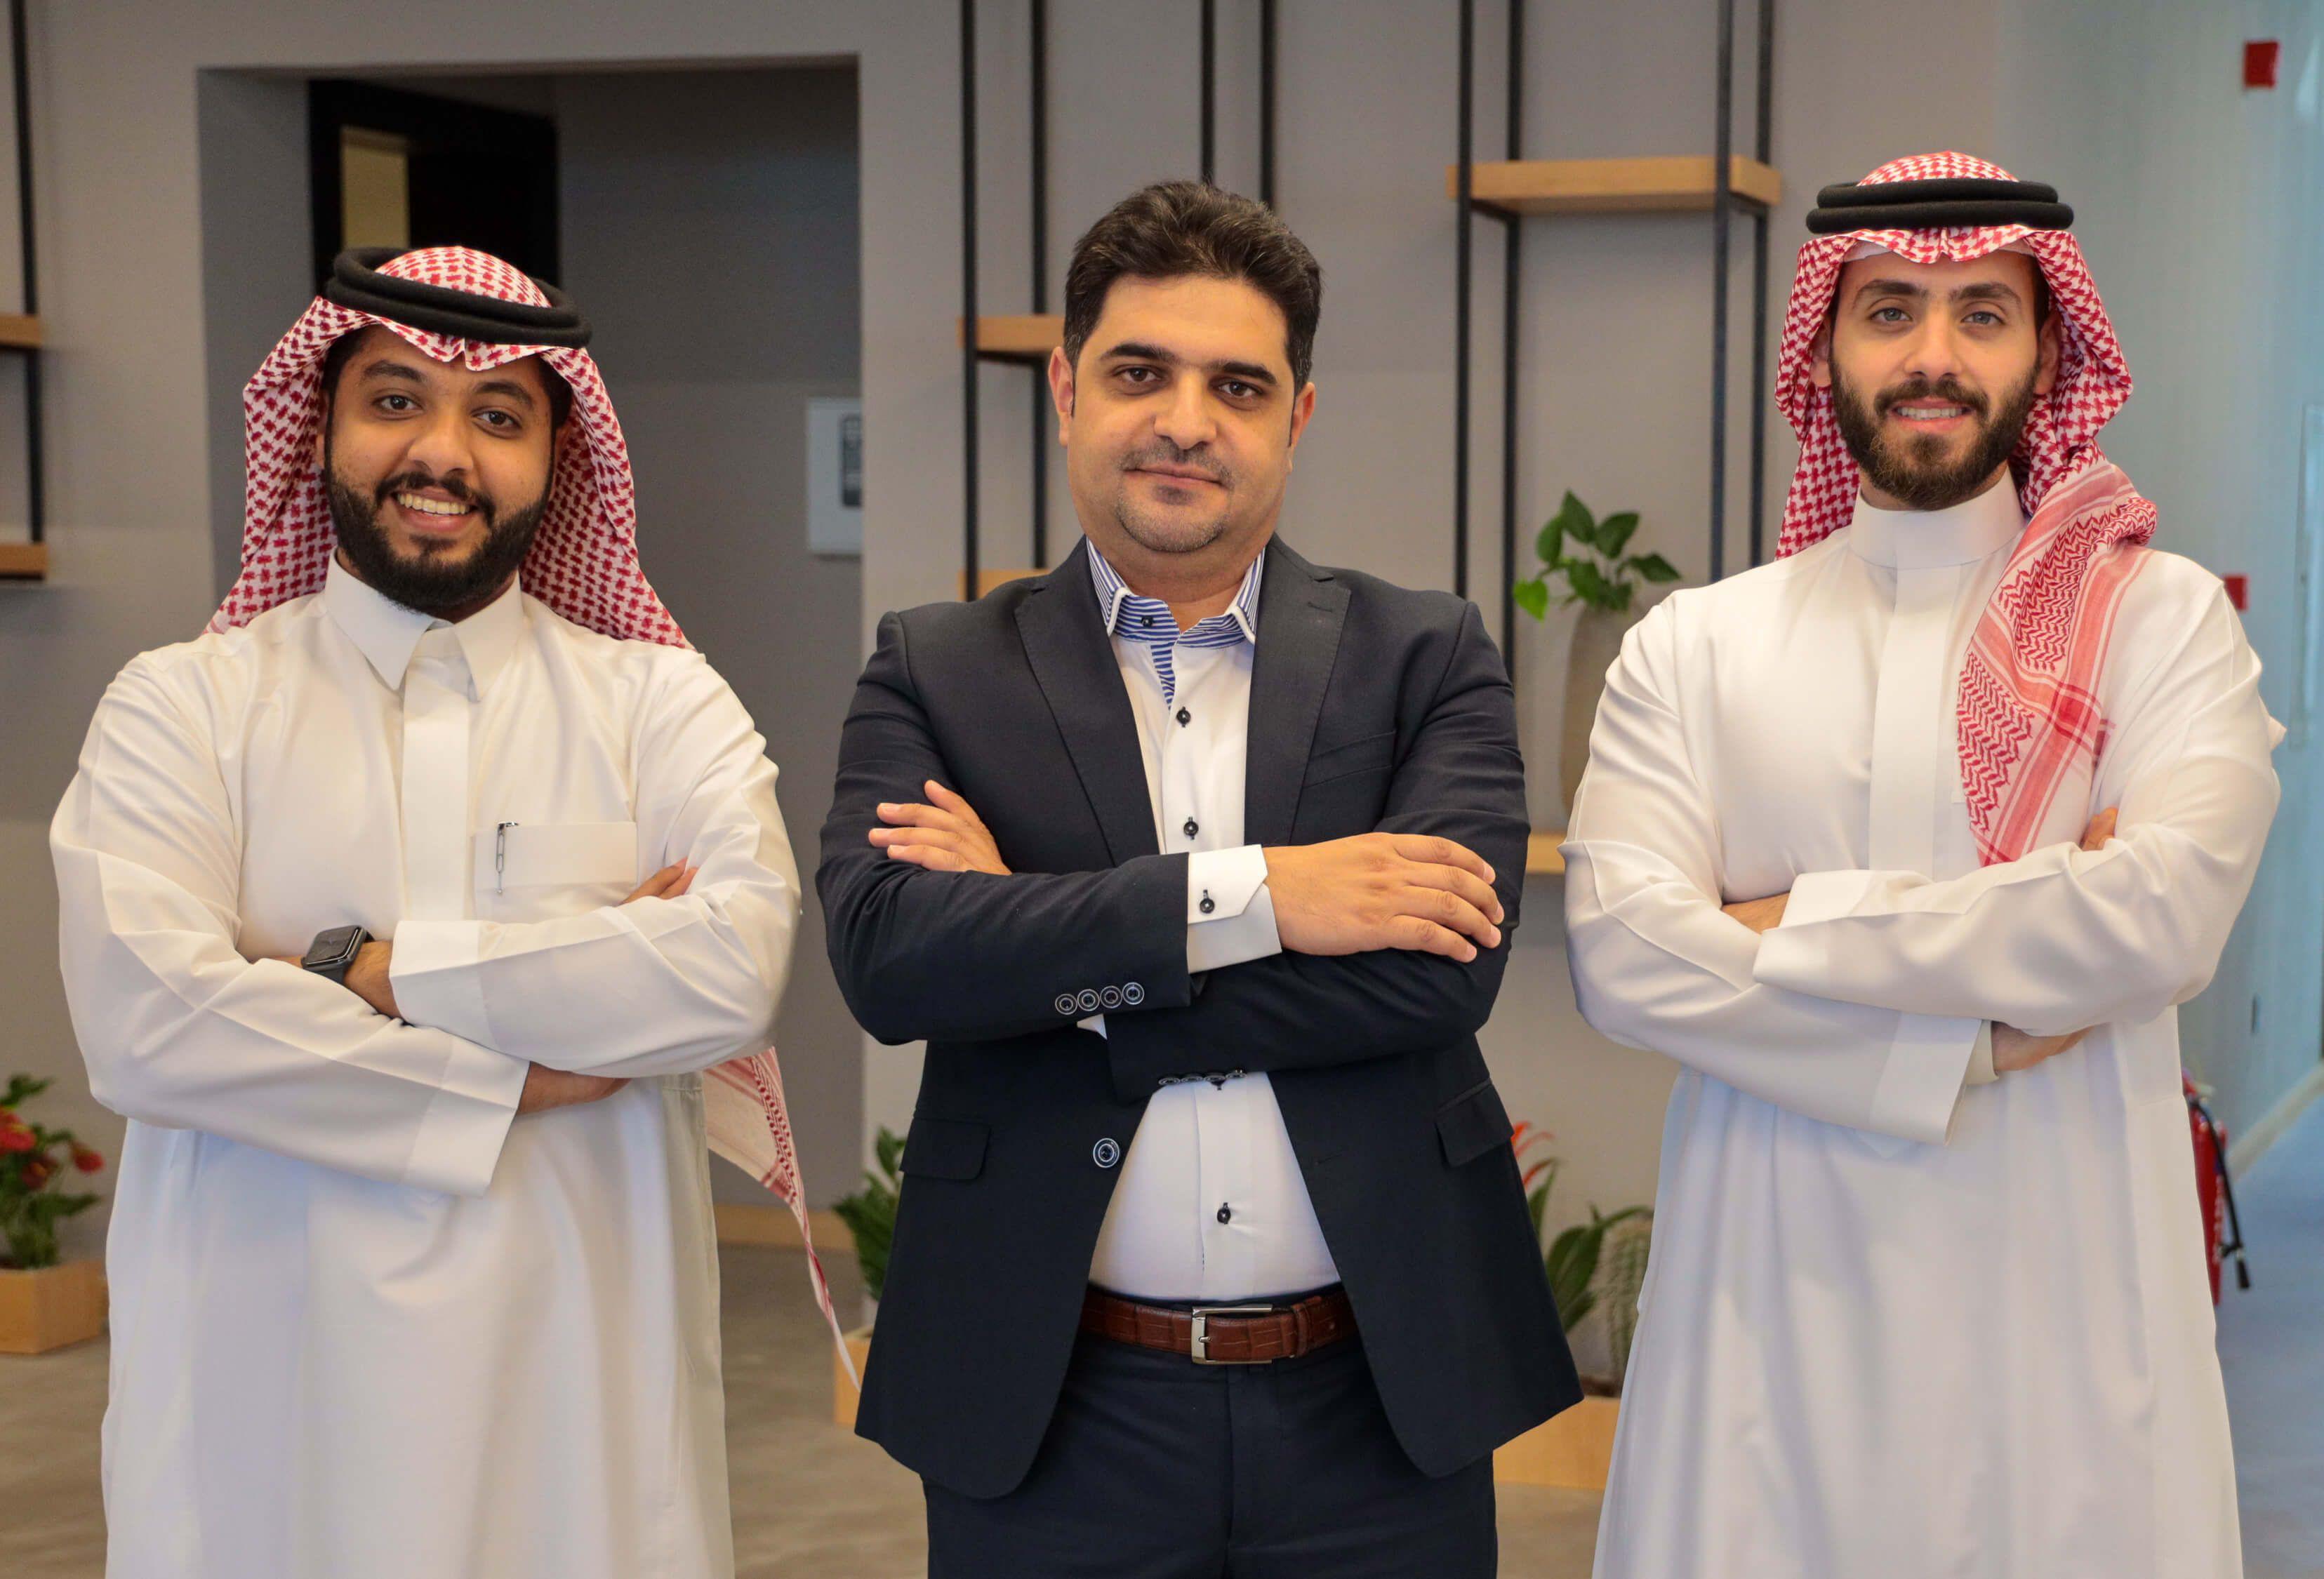 Saudi fintech CashIn secures $1.6 million Seed round